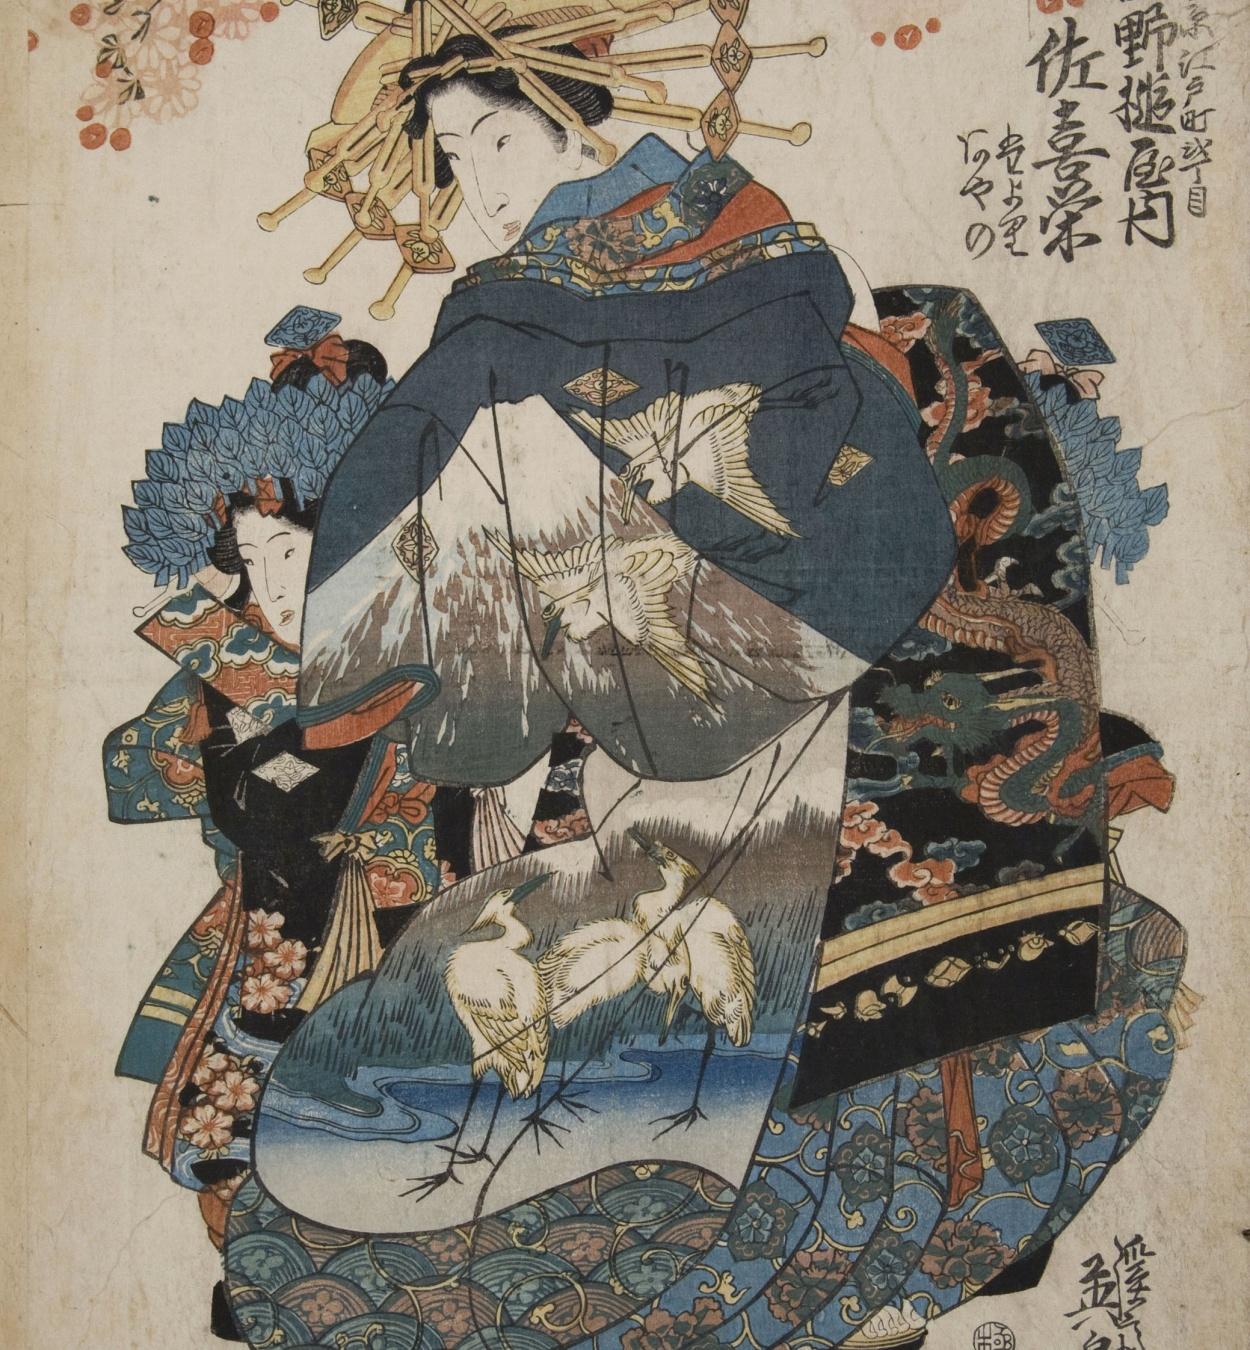 Utagawa Kunisada (Toyokuni III) - Ukiyo-e (album with seventy pictures) - End of the 18th century – mid-19th century [6]